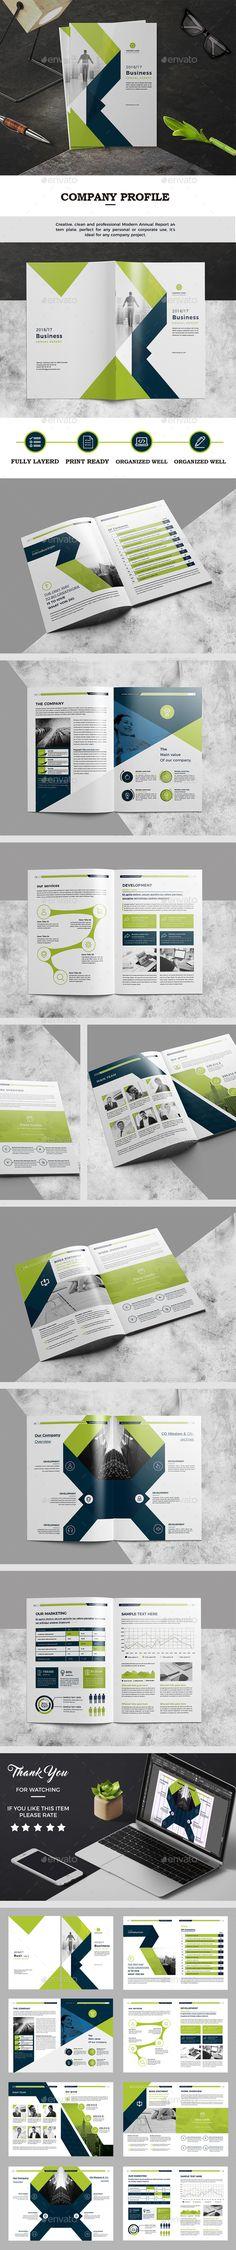 Catalogue / Brochure Template Brochure template, Template and - program proposal template